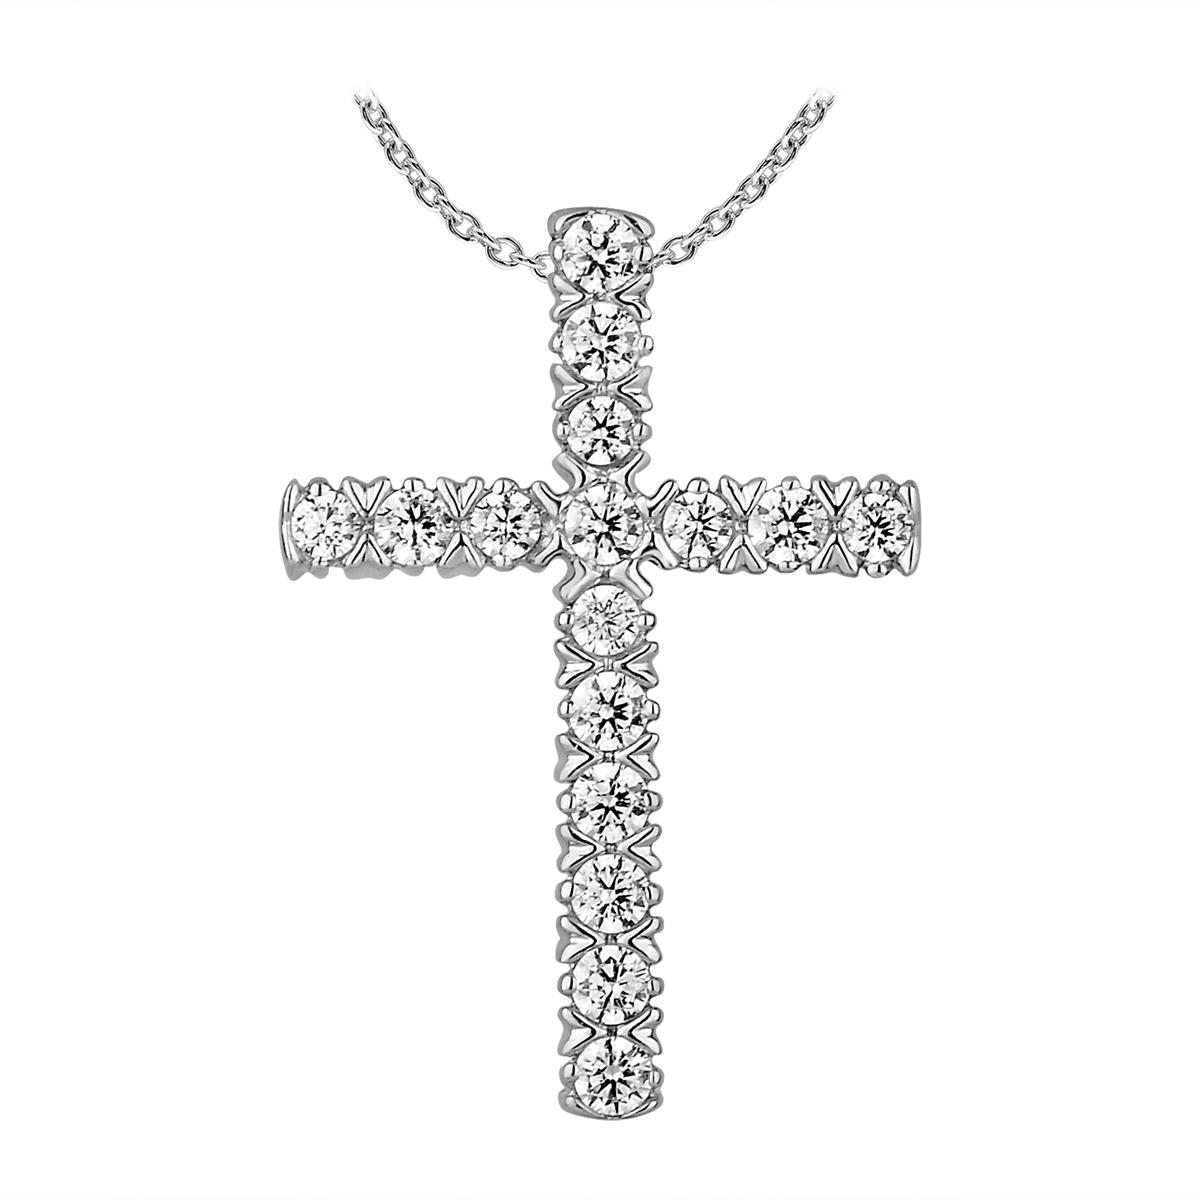 Paramount Gems 14 Karat White Gold Diamond Cross Pendant Necklace